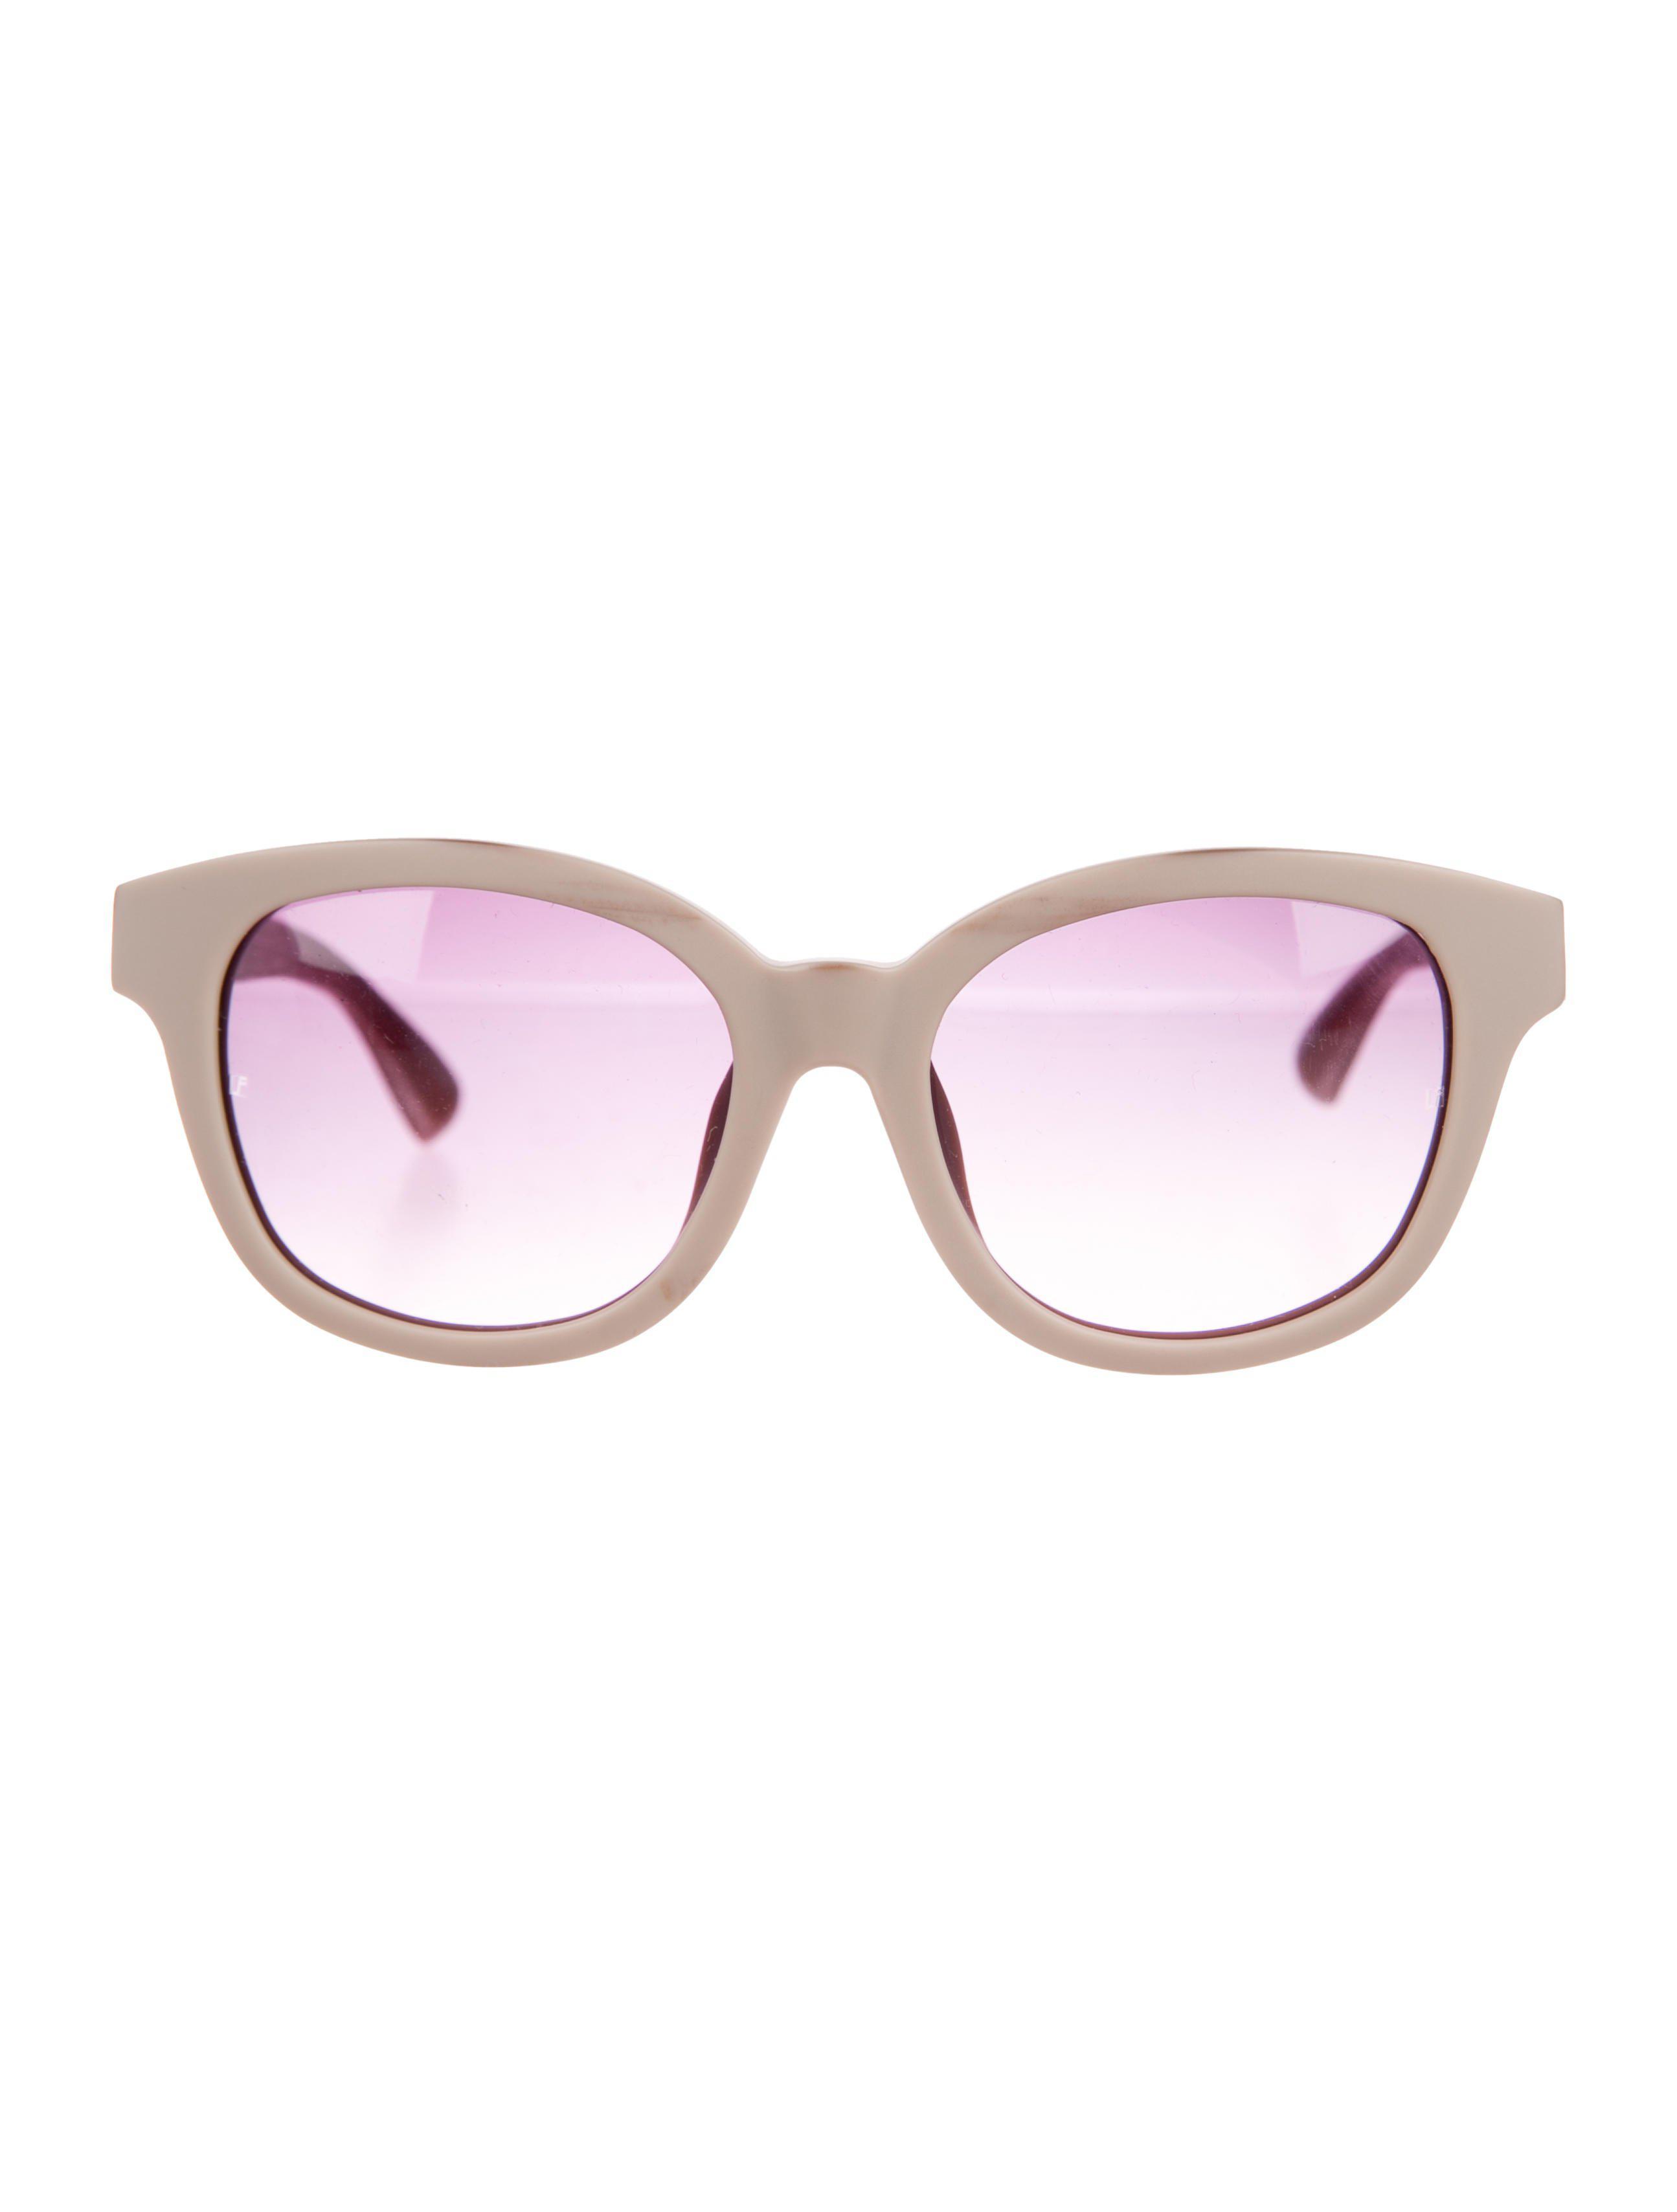 4b93c2fae8d1 Lyst - Linda Farrow Matte Gradient Sunglasses in Purple